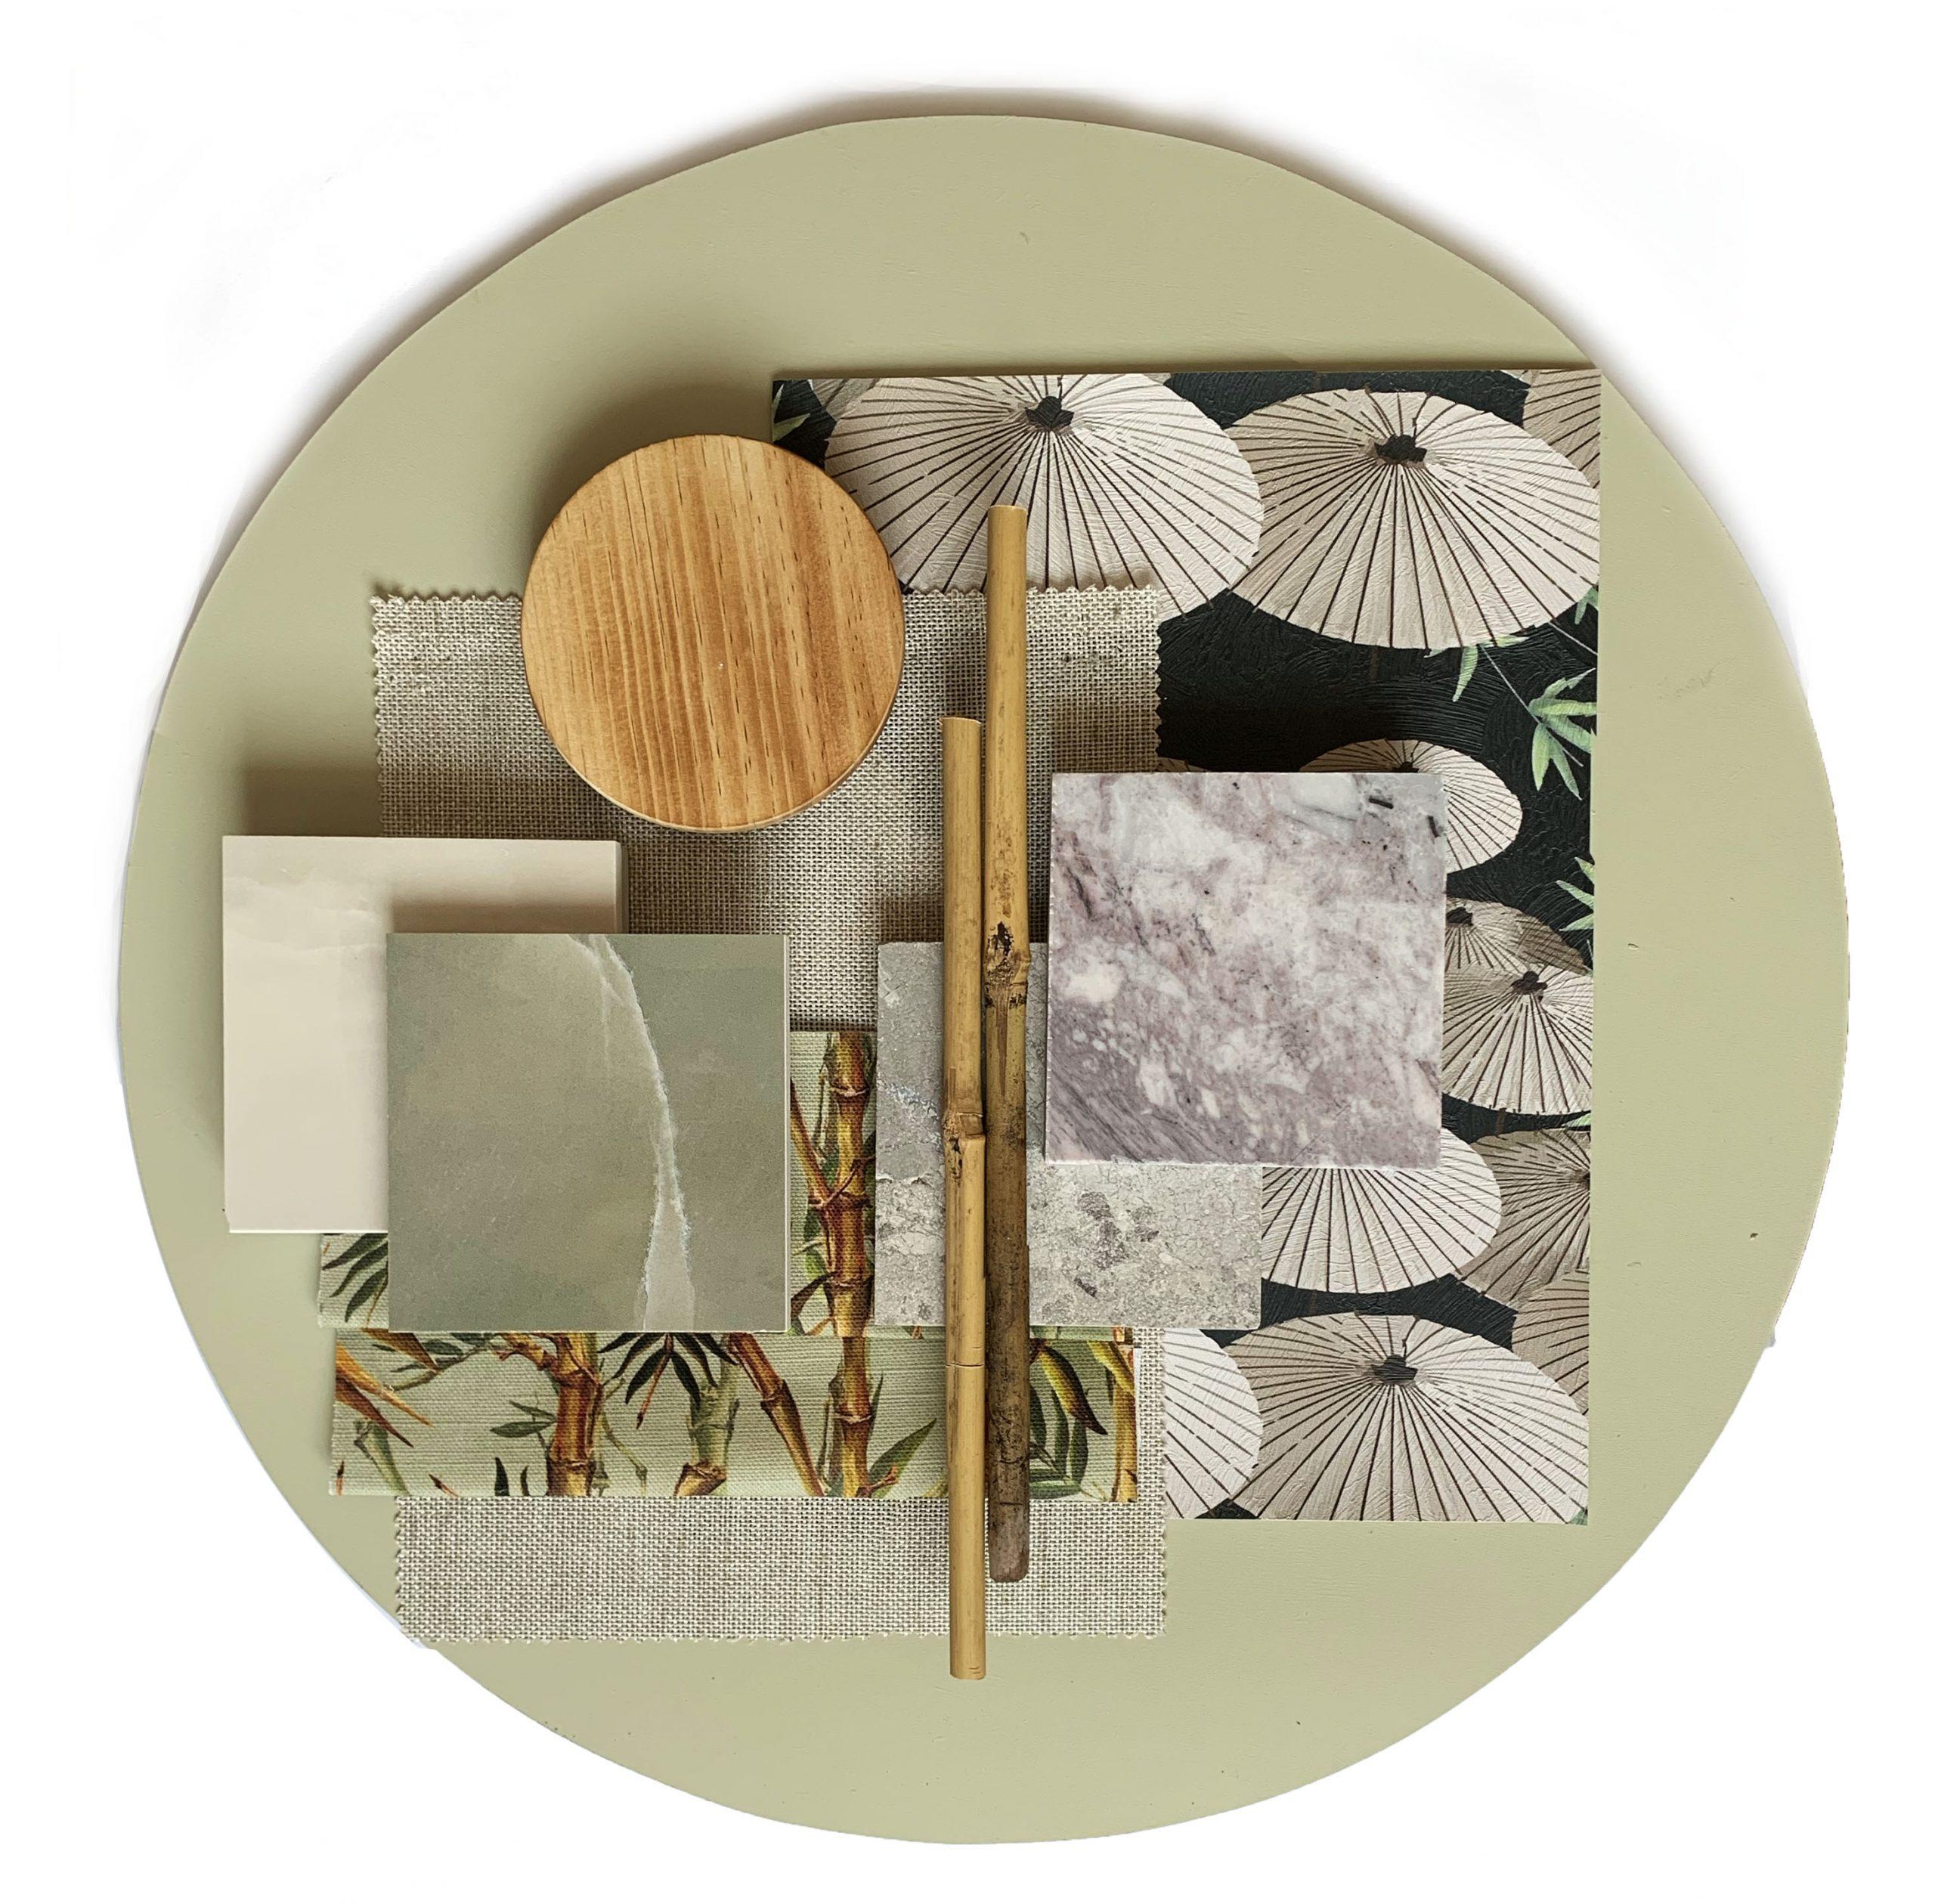 KUKU Japanese Restaurant, materials board